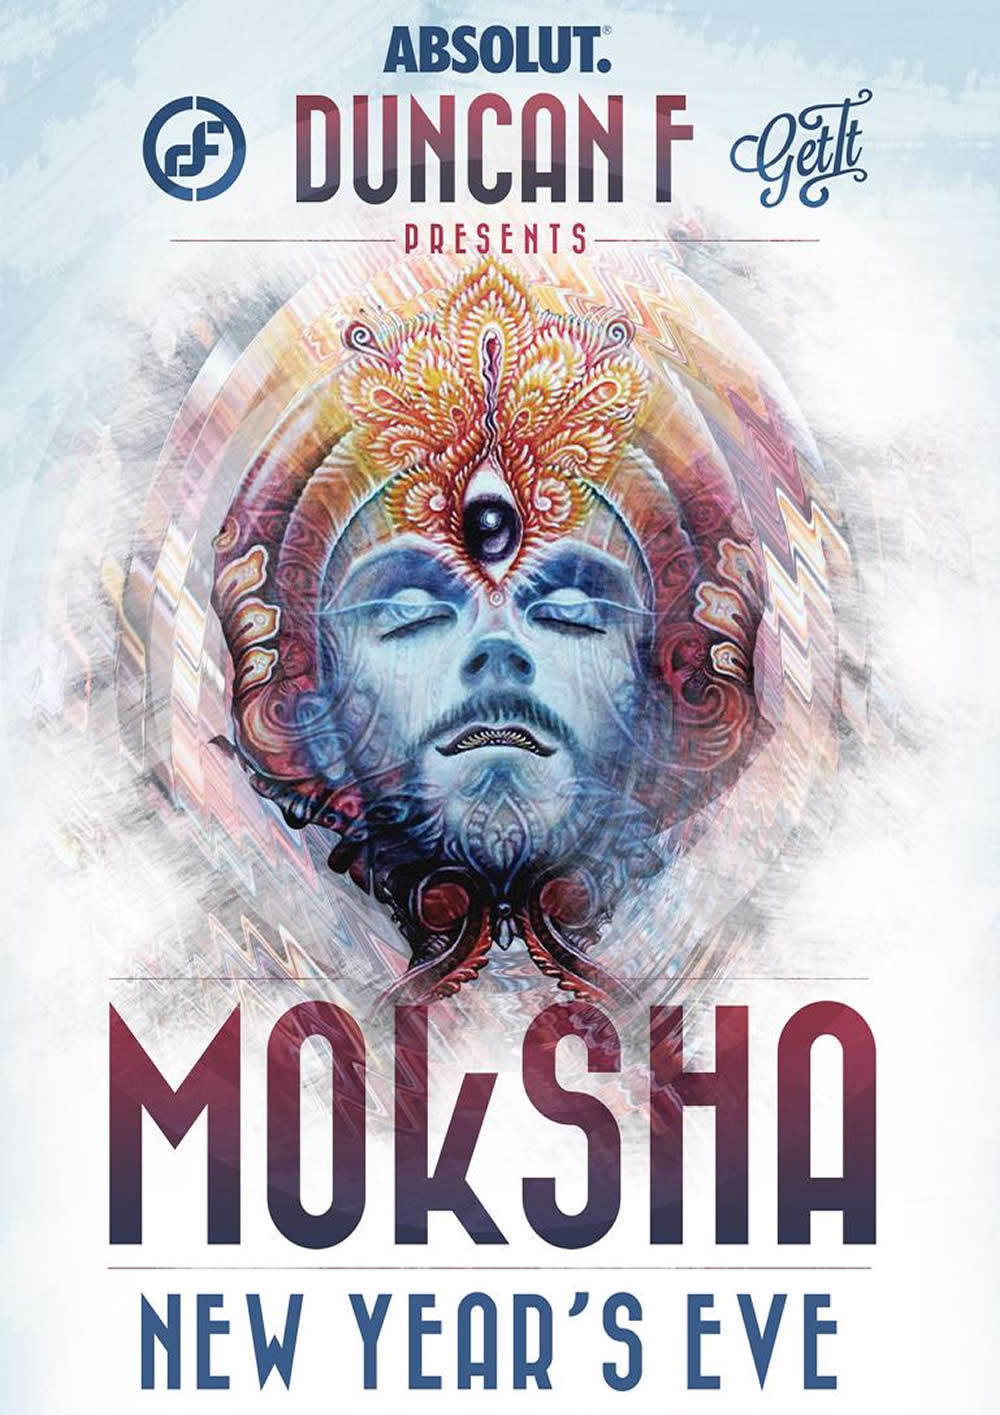 MOkSHA - New Year's Eve by Duncan F & GET it flyer